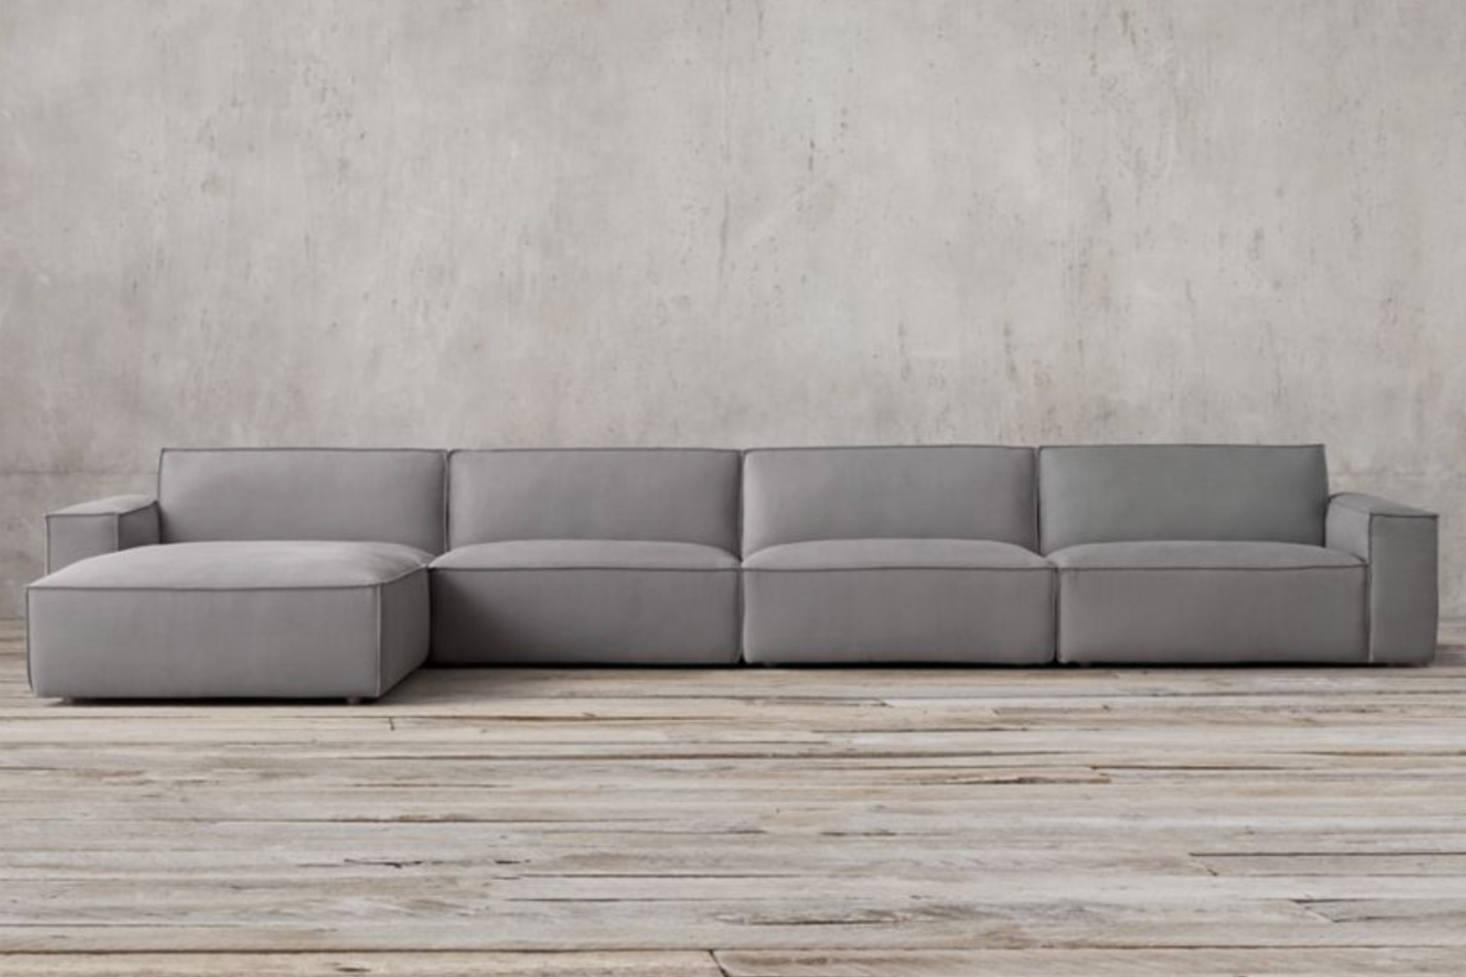 Even Restoration Hardware jumped on the clunky modular sofa bandwagon with  their Como Modular Sofa Sectional